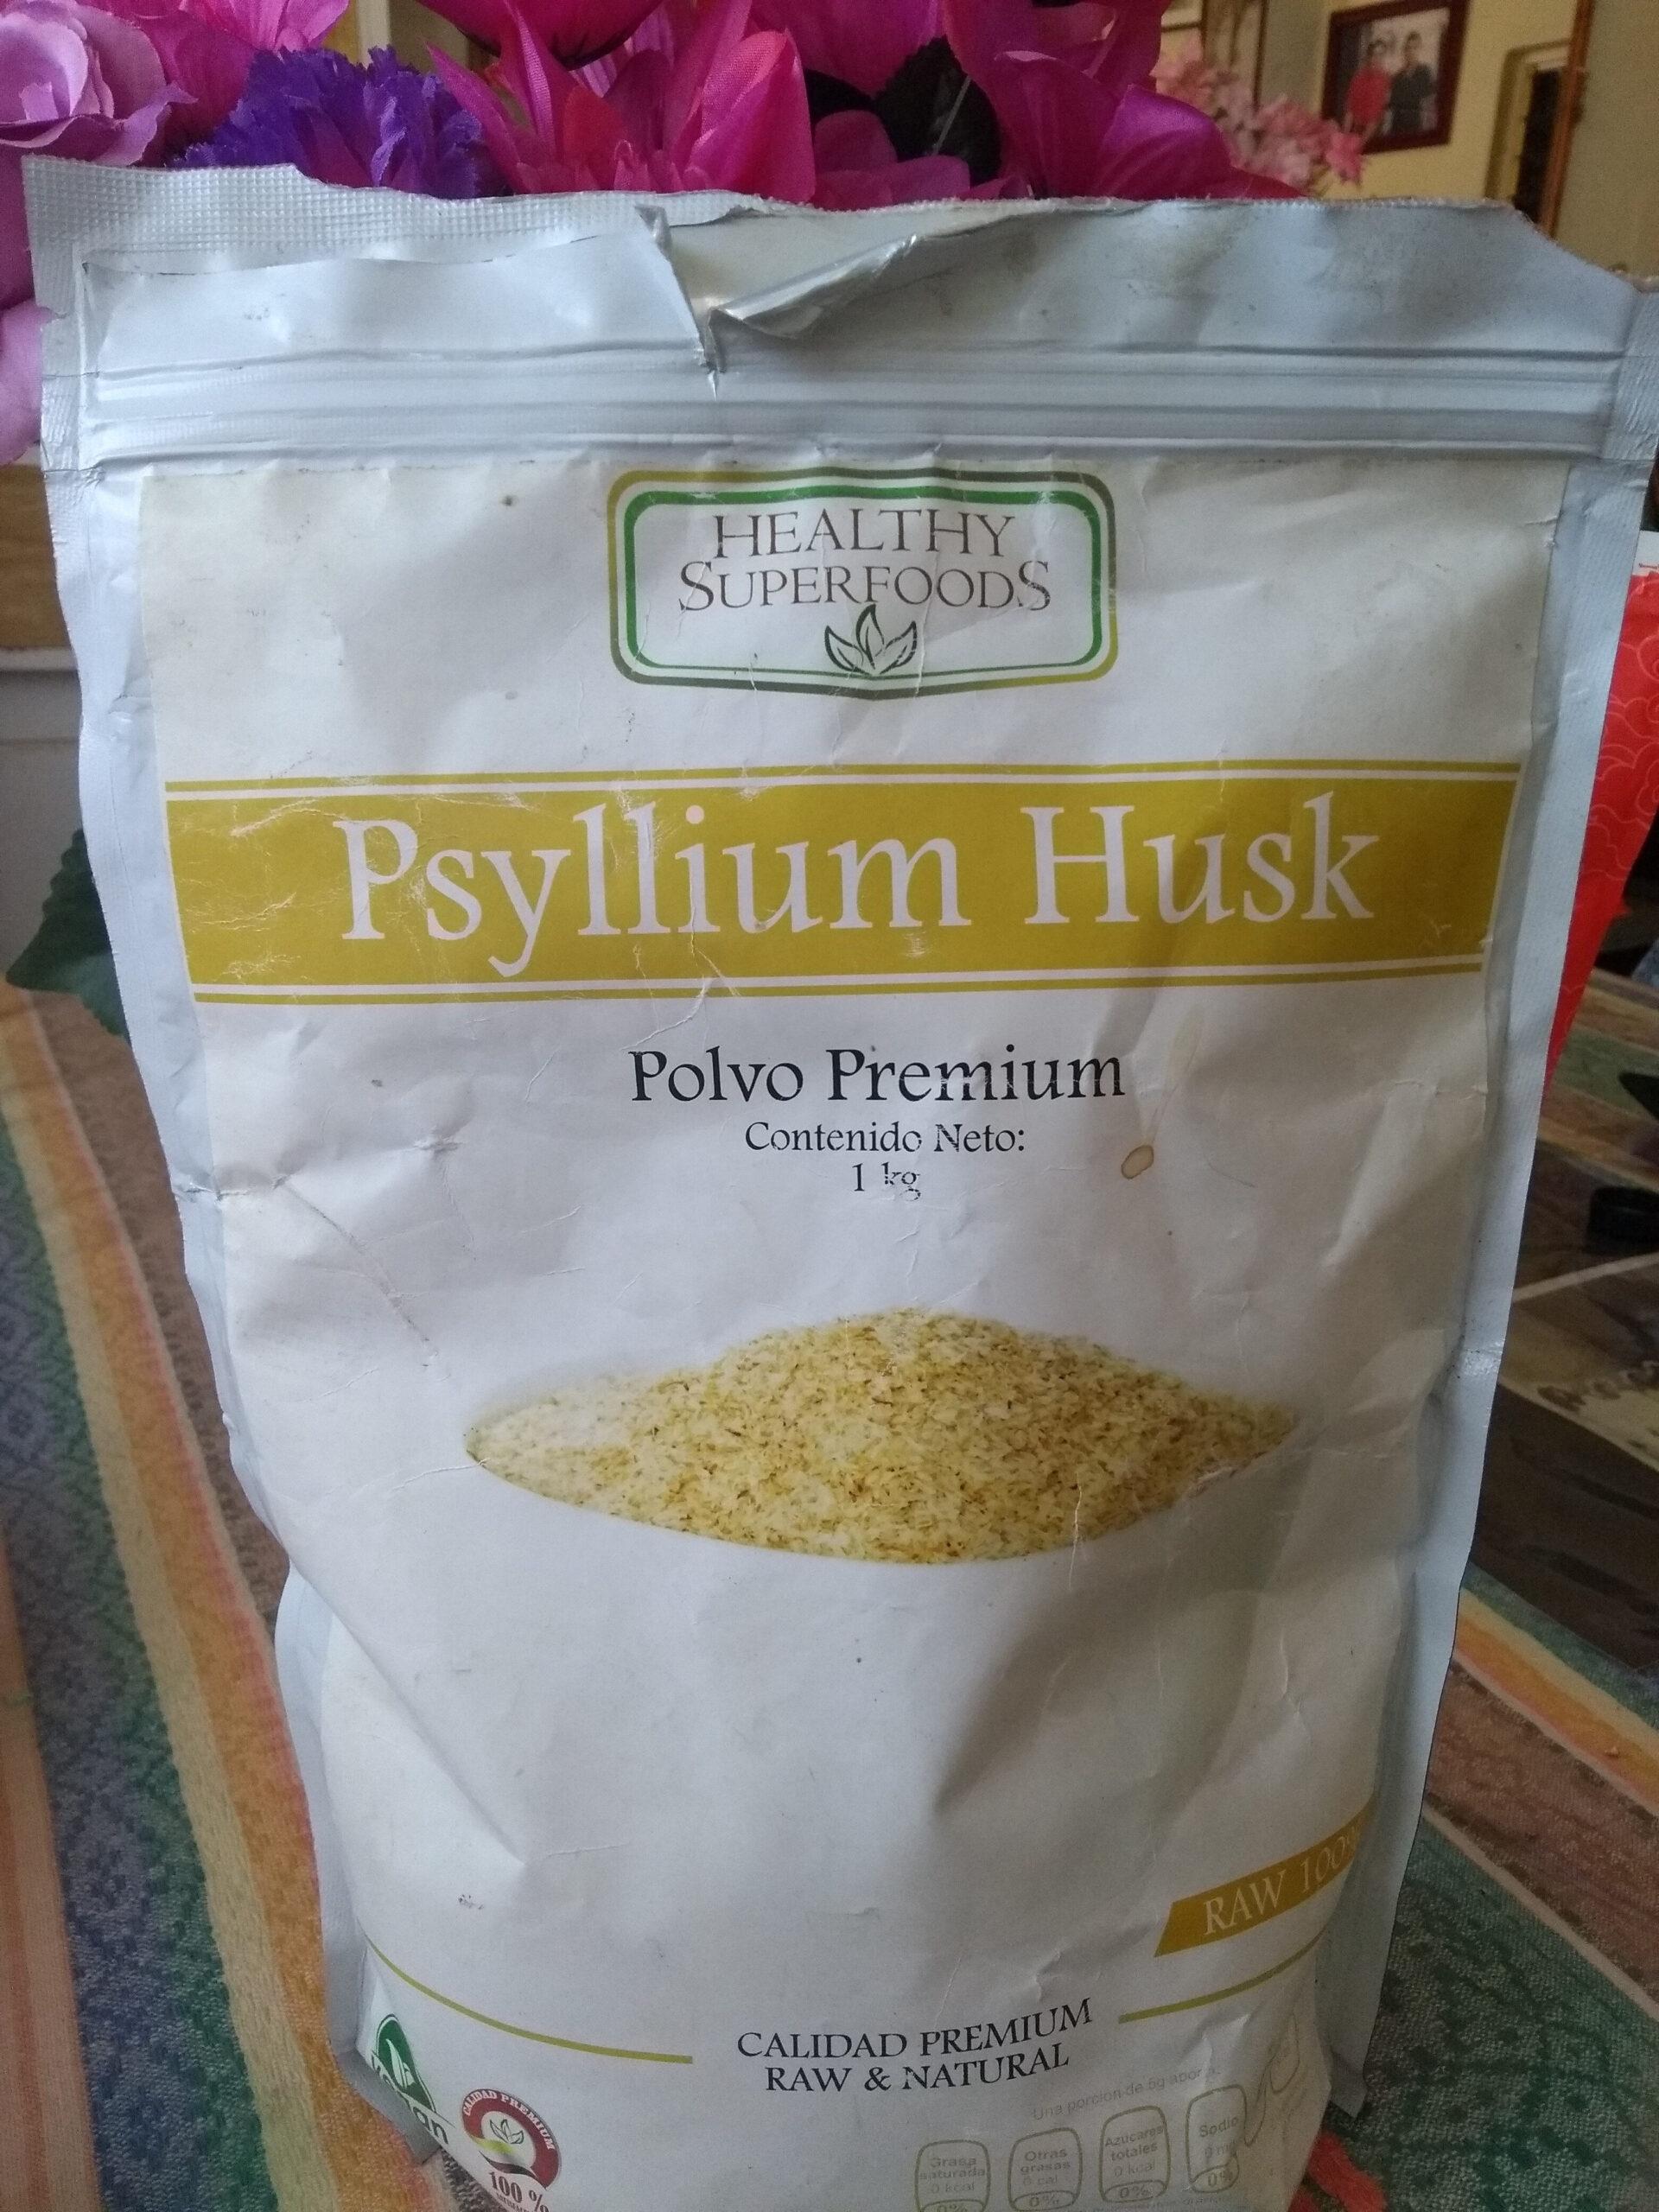 Difference between Metamucil and Psyllium